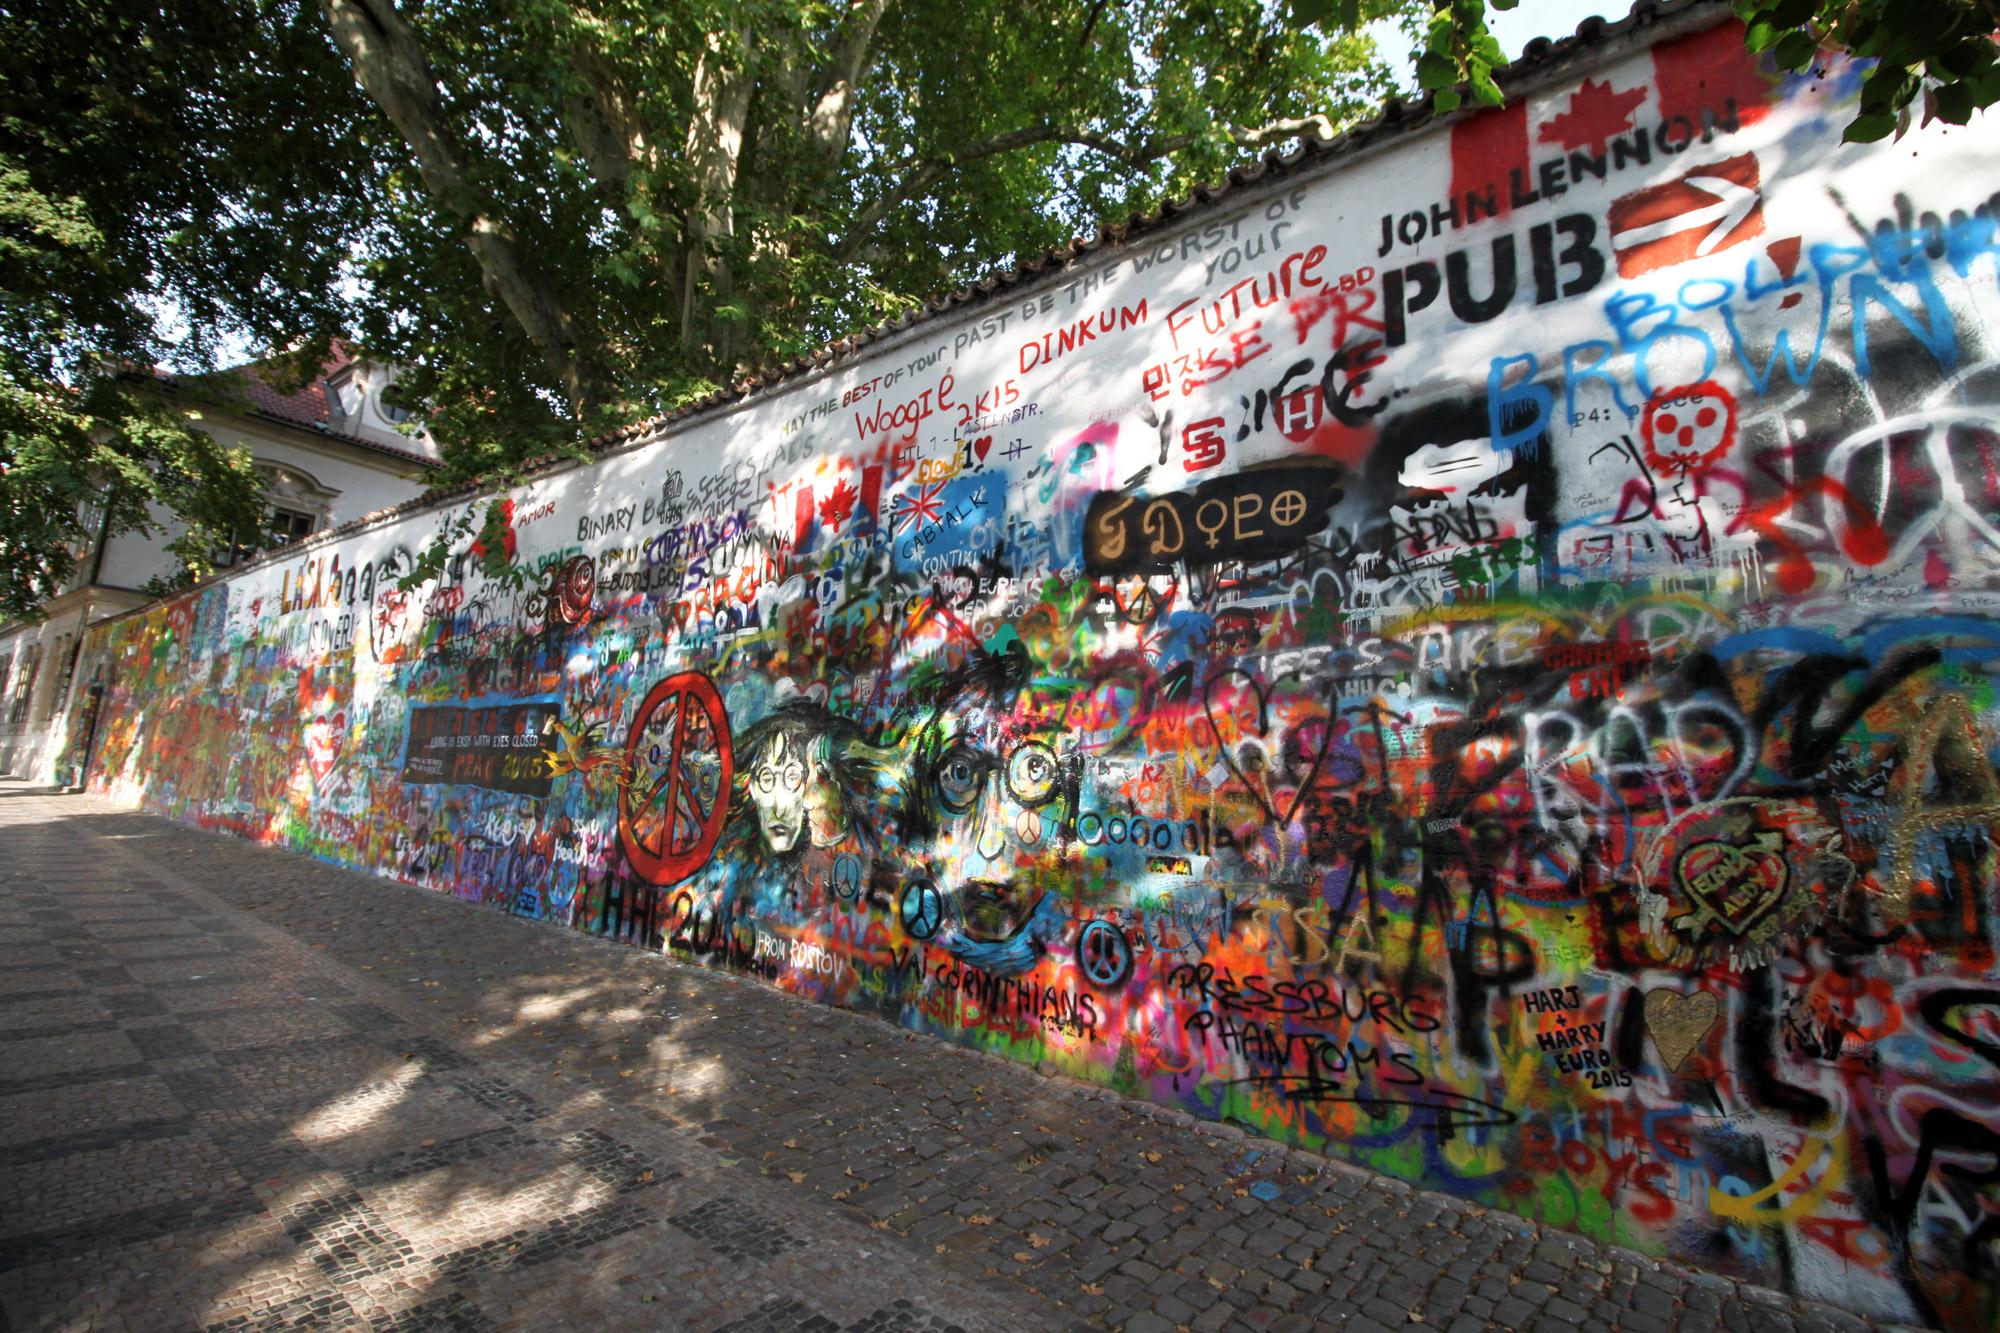 Fietsen door Praag - John Lennon Wall